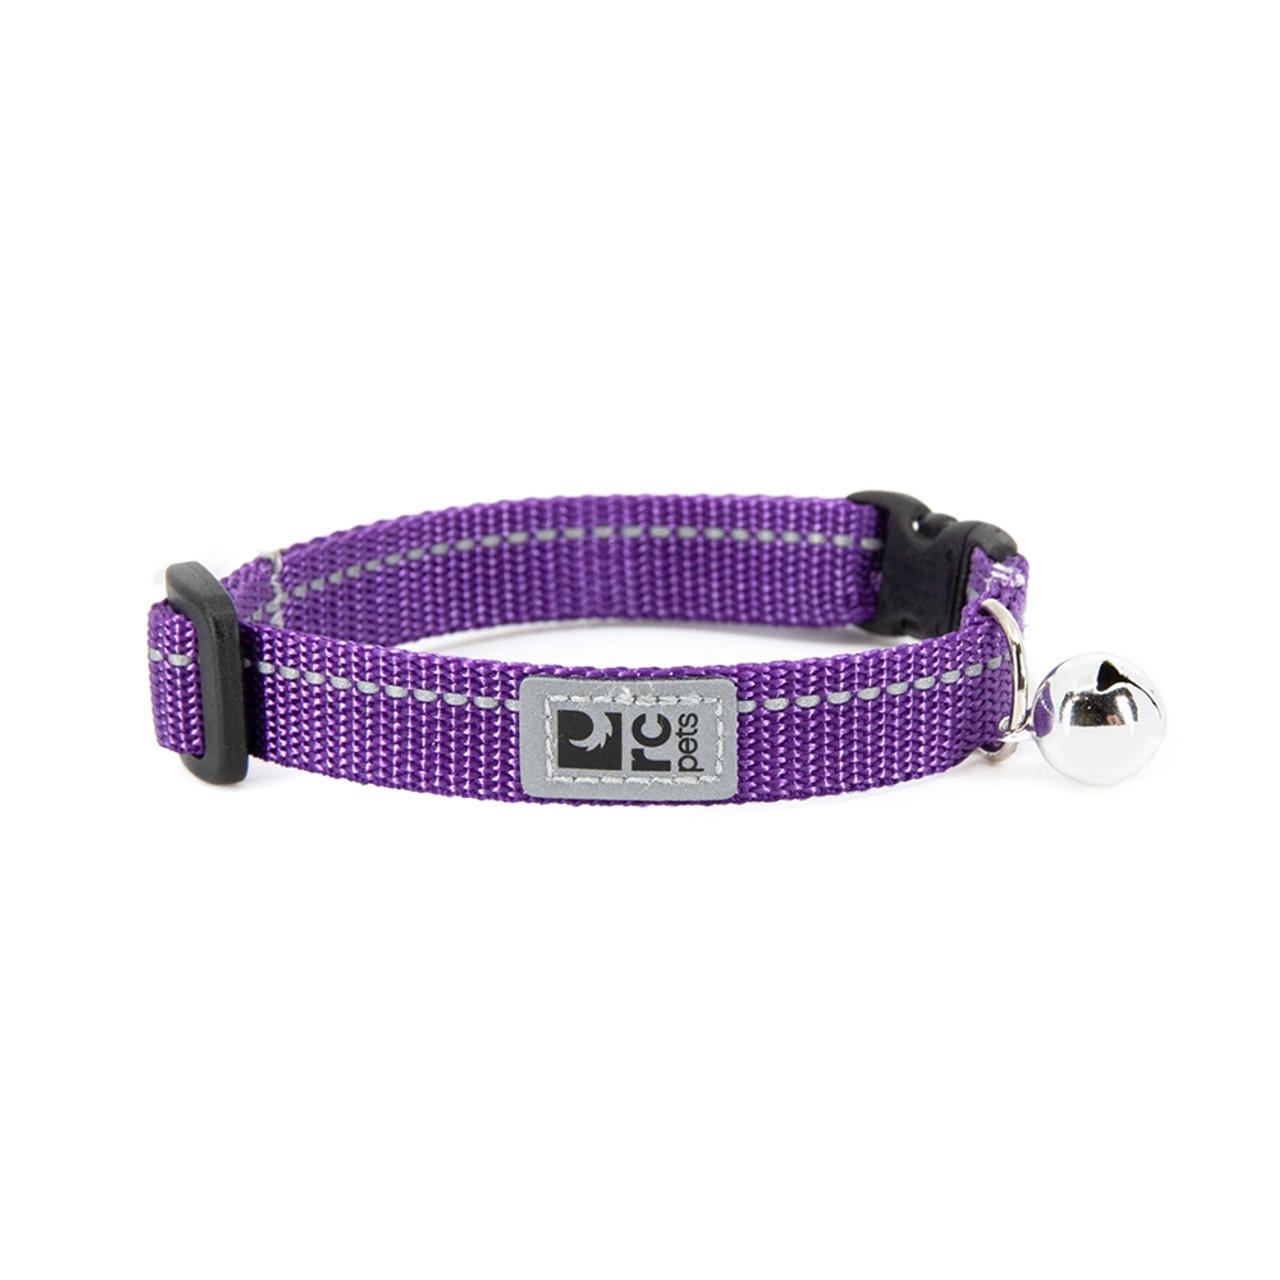 RC Pets Primary Kitty Breakaway Cat Collar - Purple